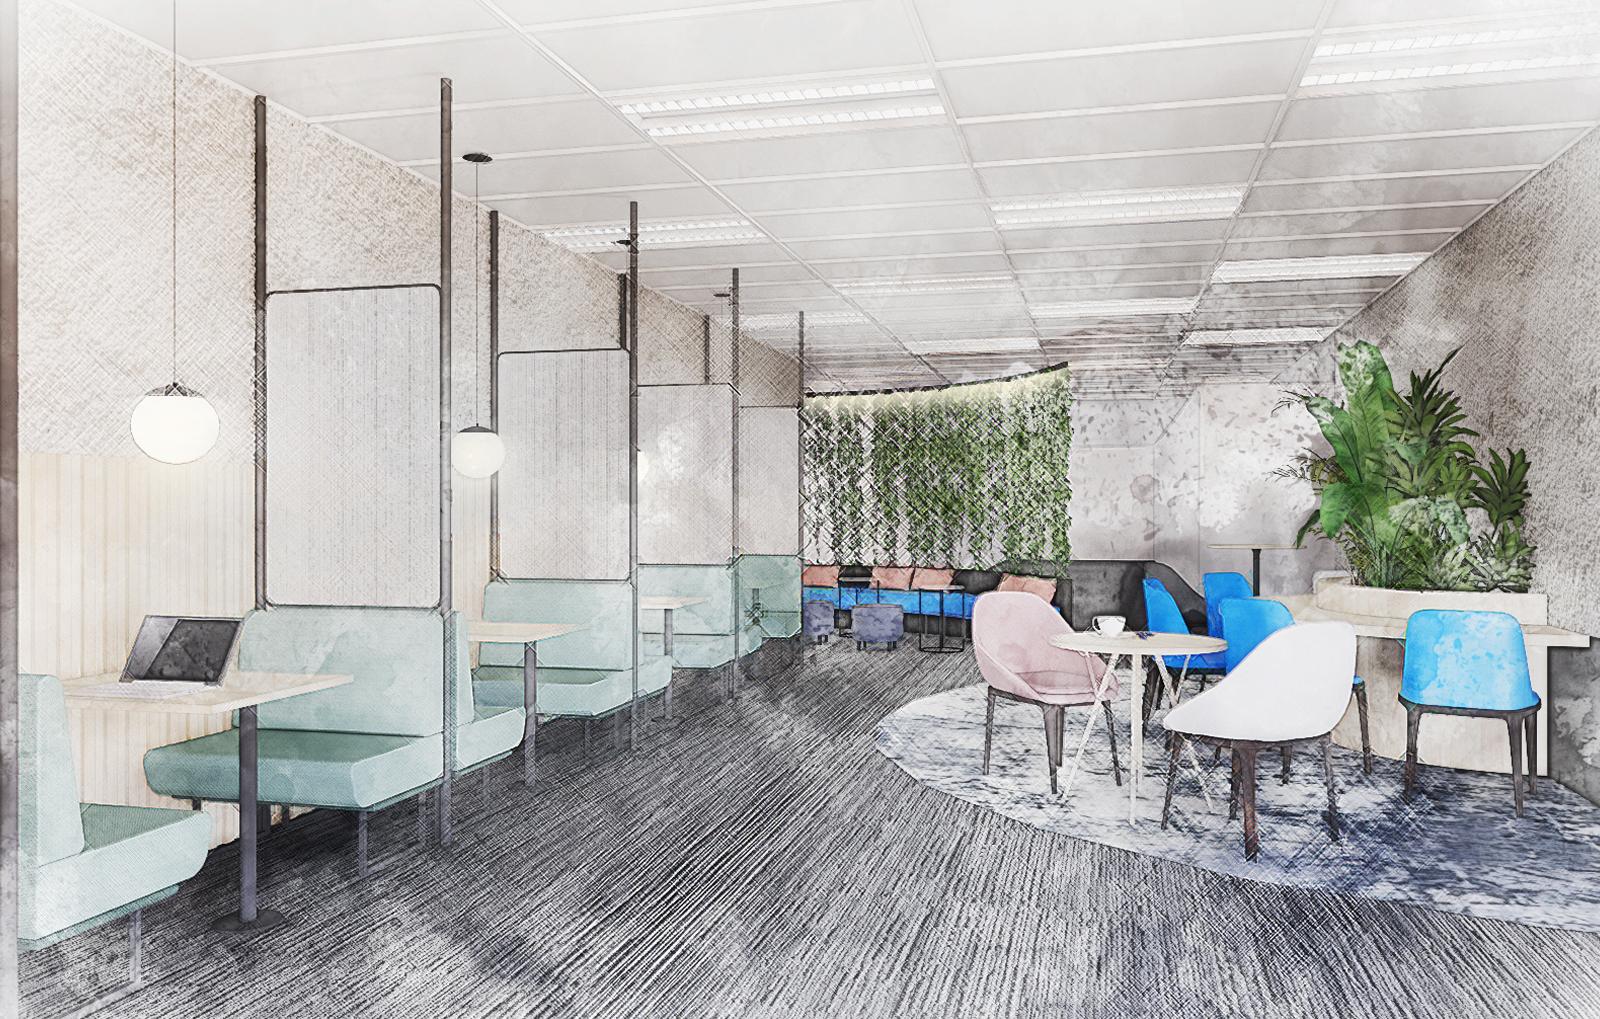 BANK (office) | Sydney